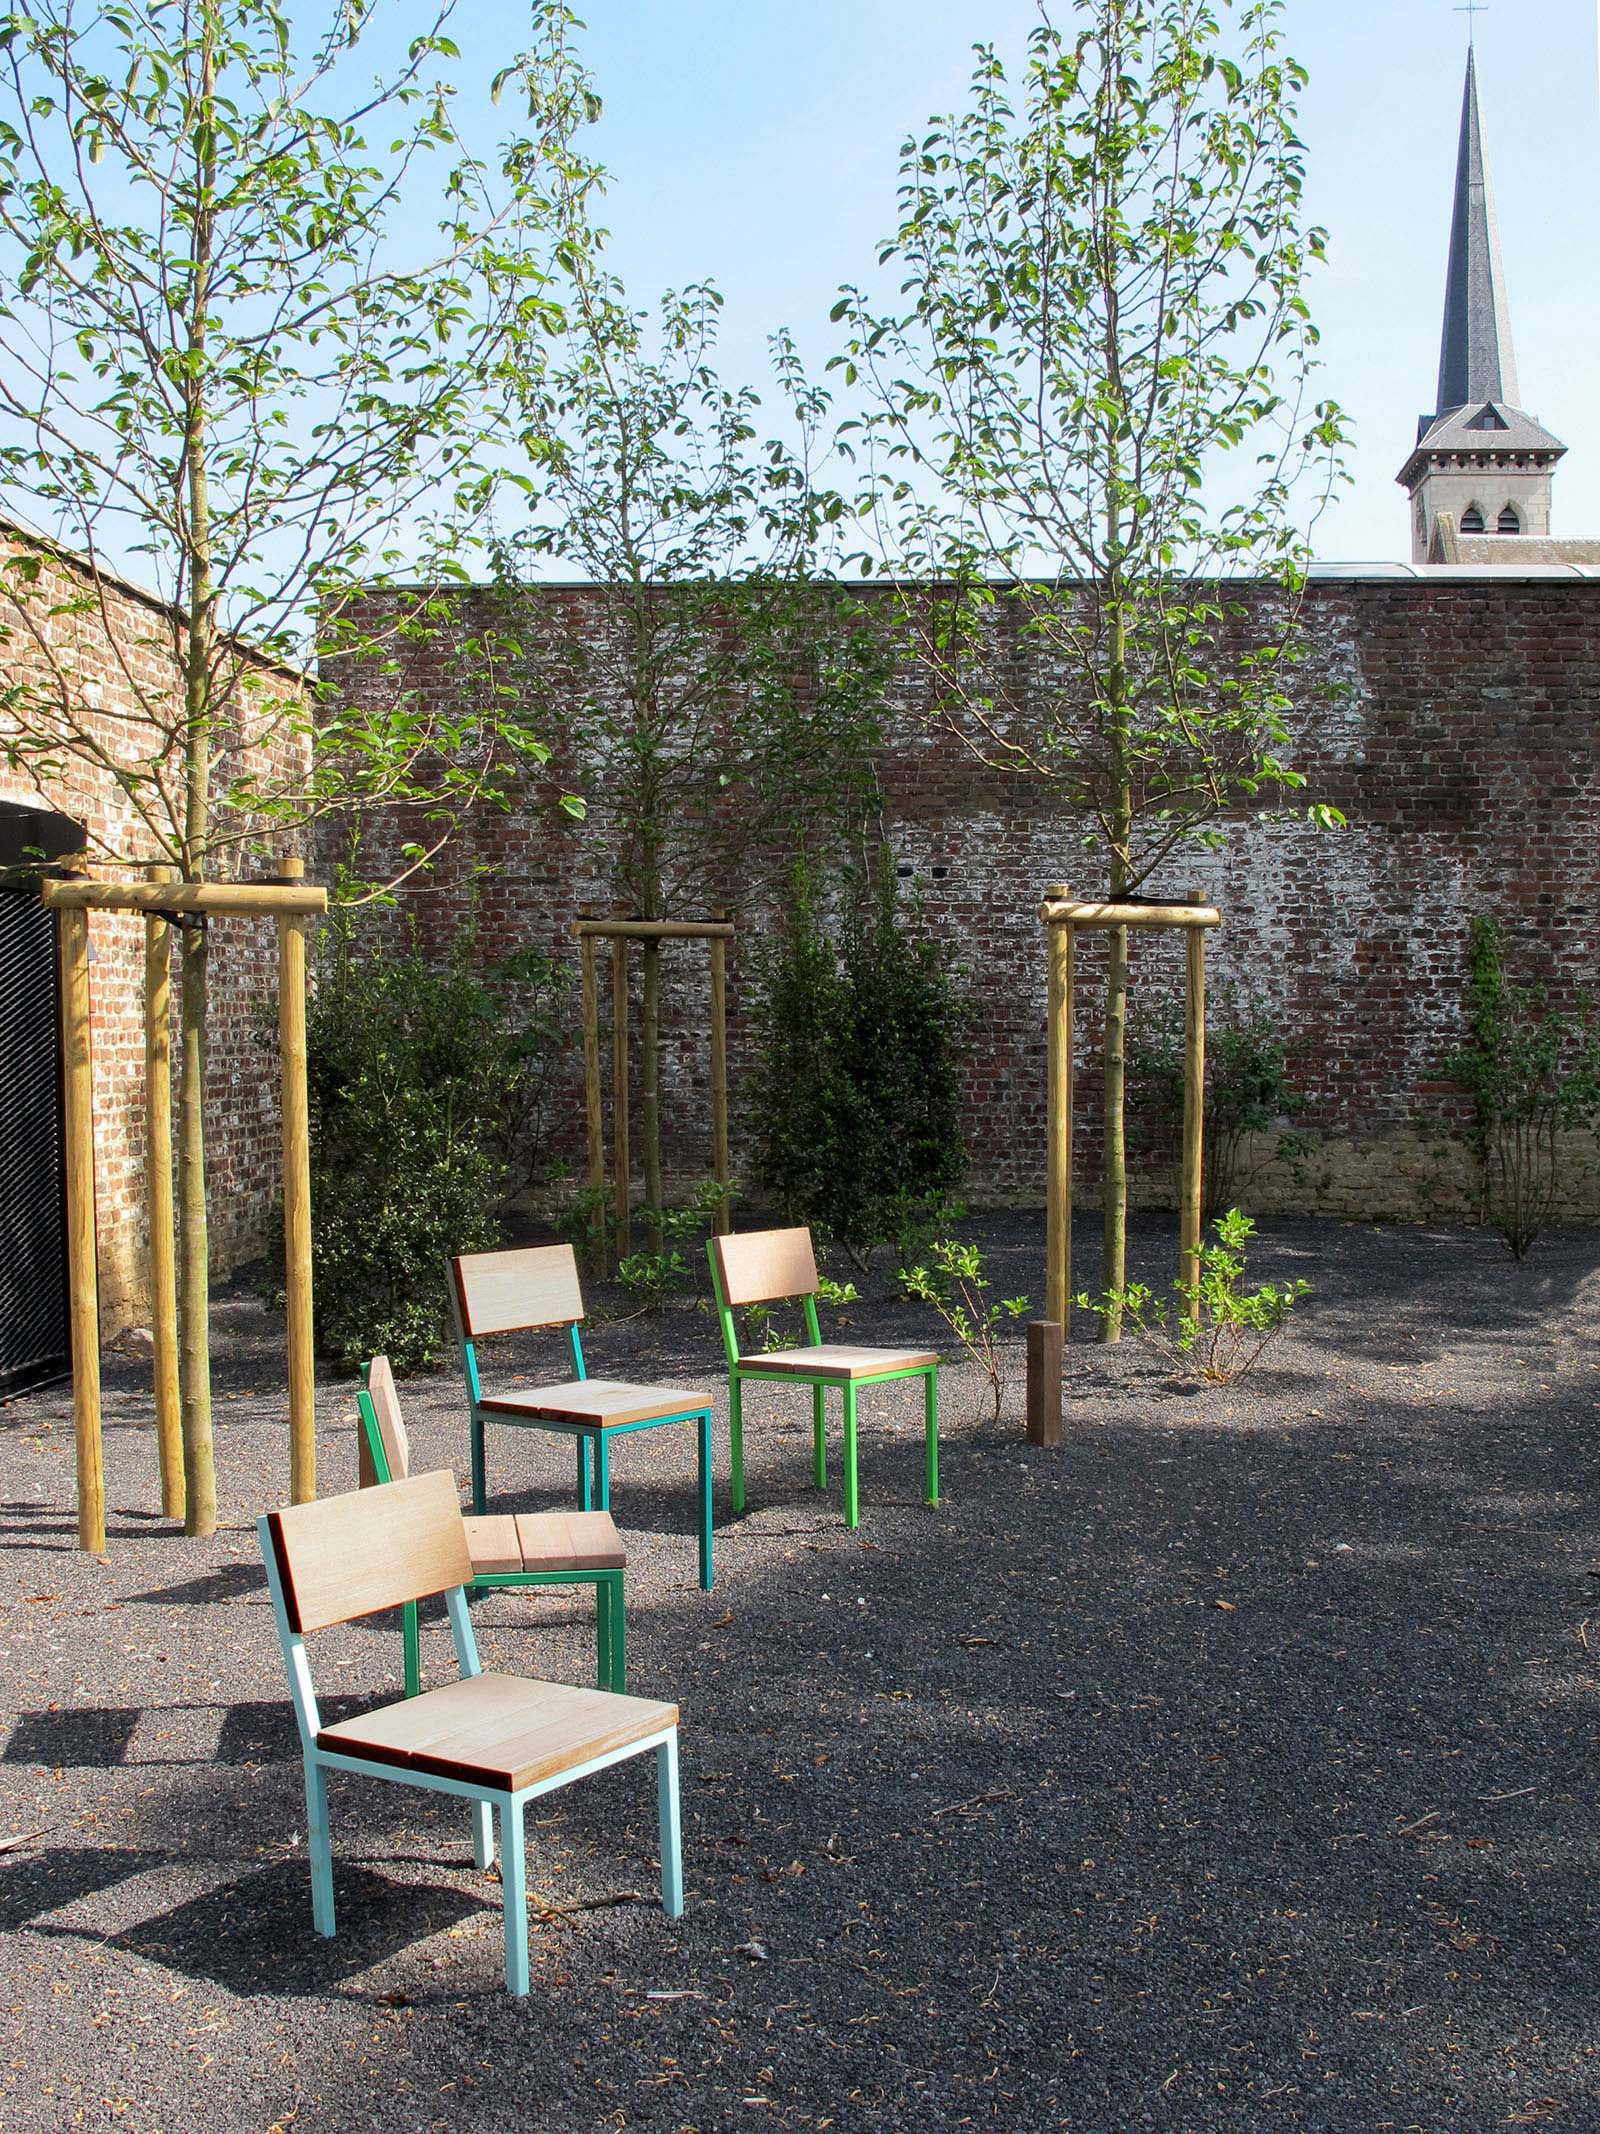 mobilier urbain_myplace_Molenbeek- Lucile Soufflet_1